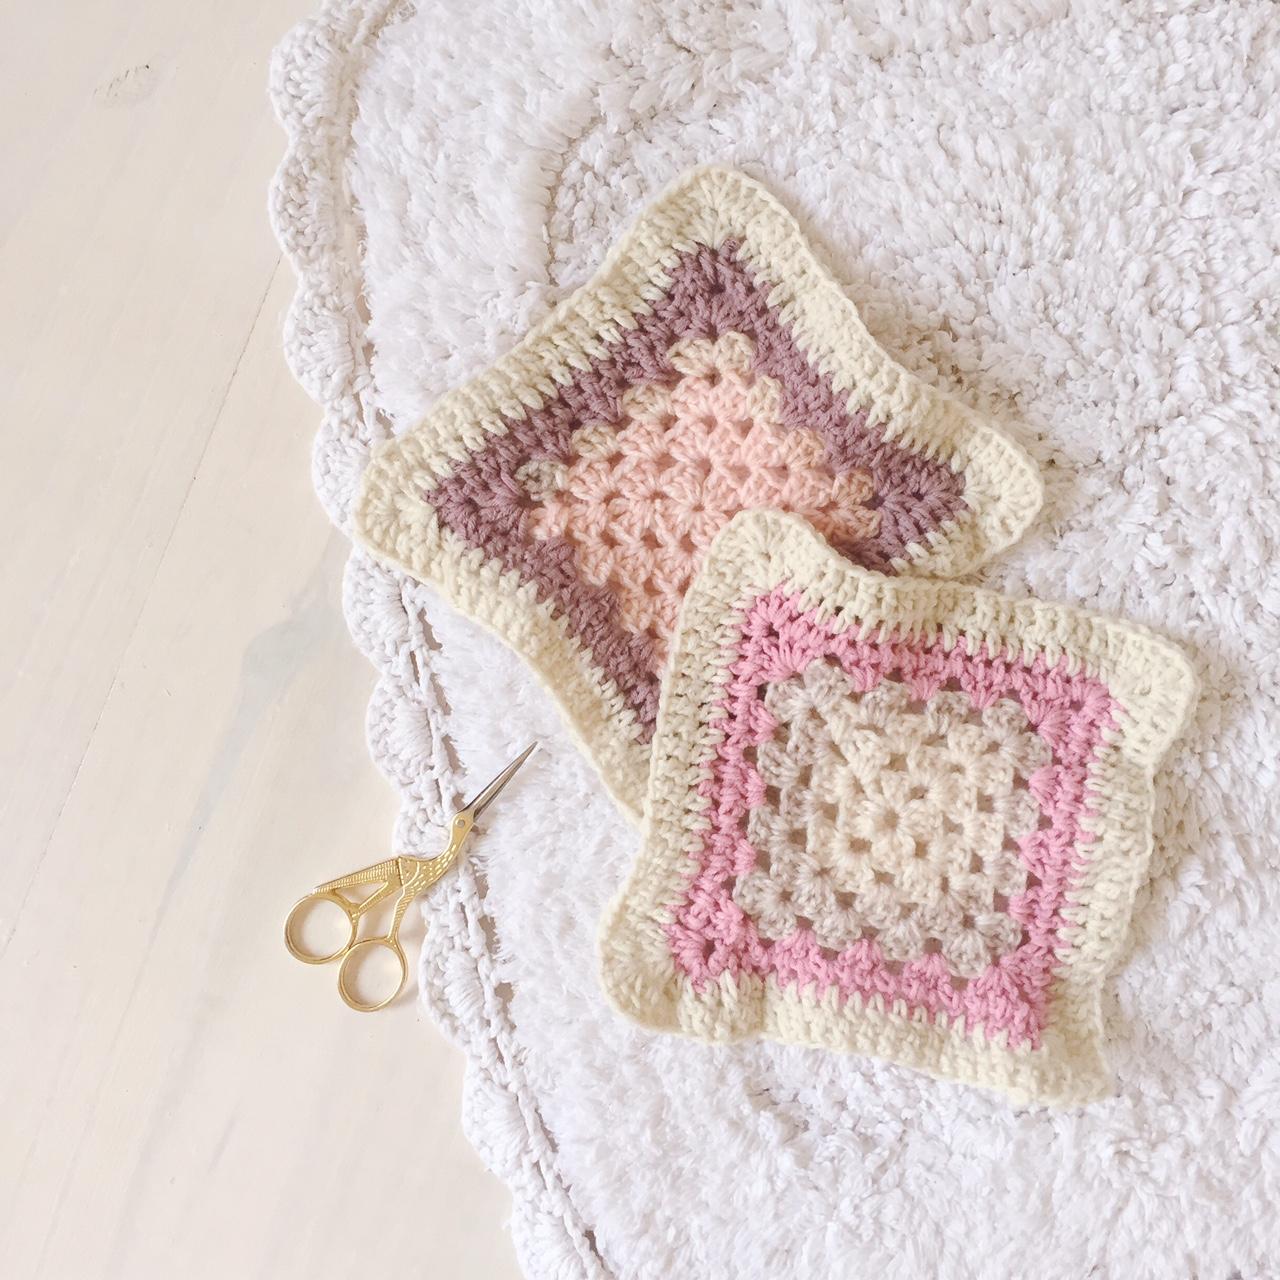 Craft Project - Crochet baby blanket